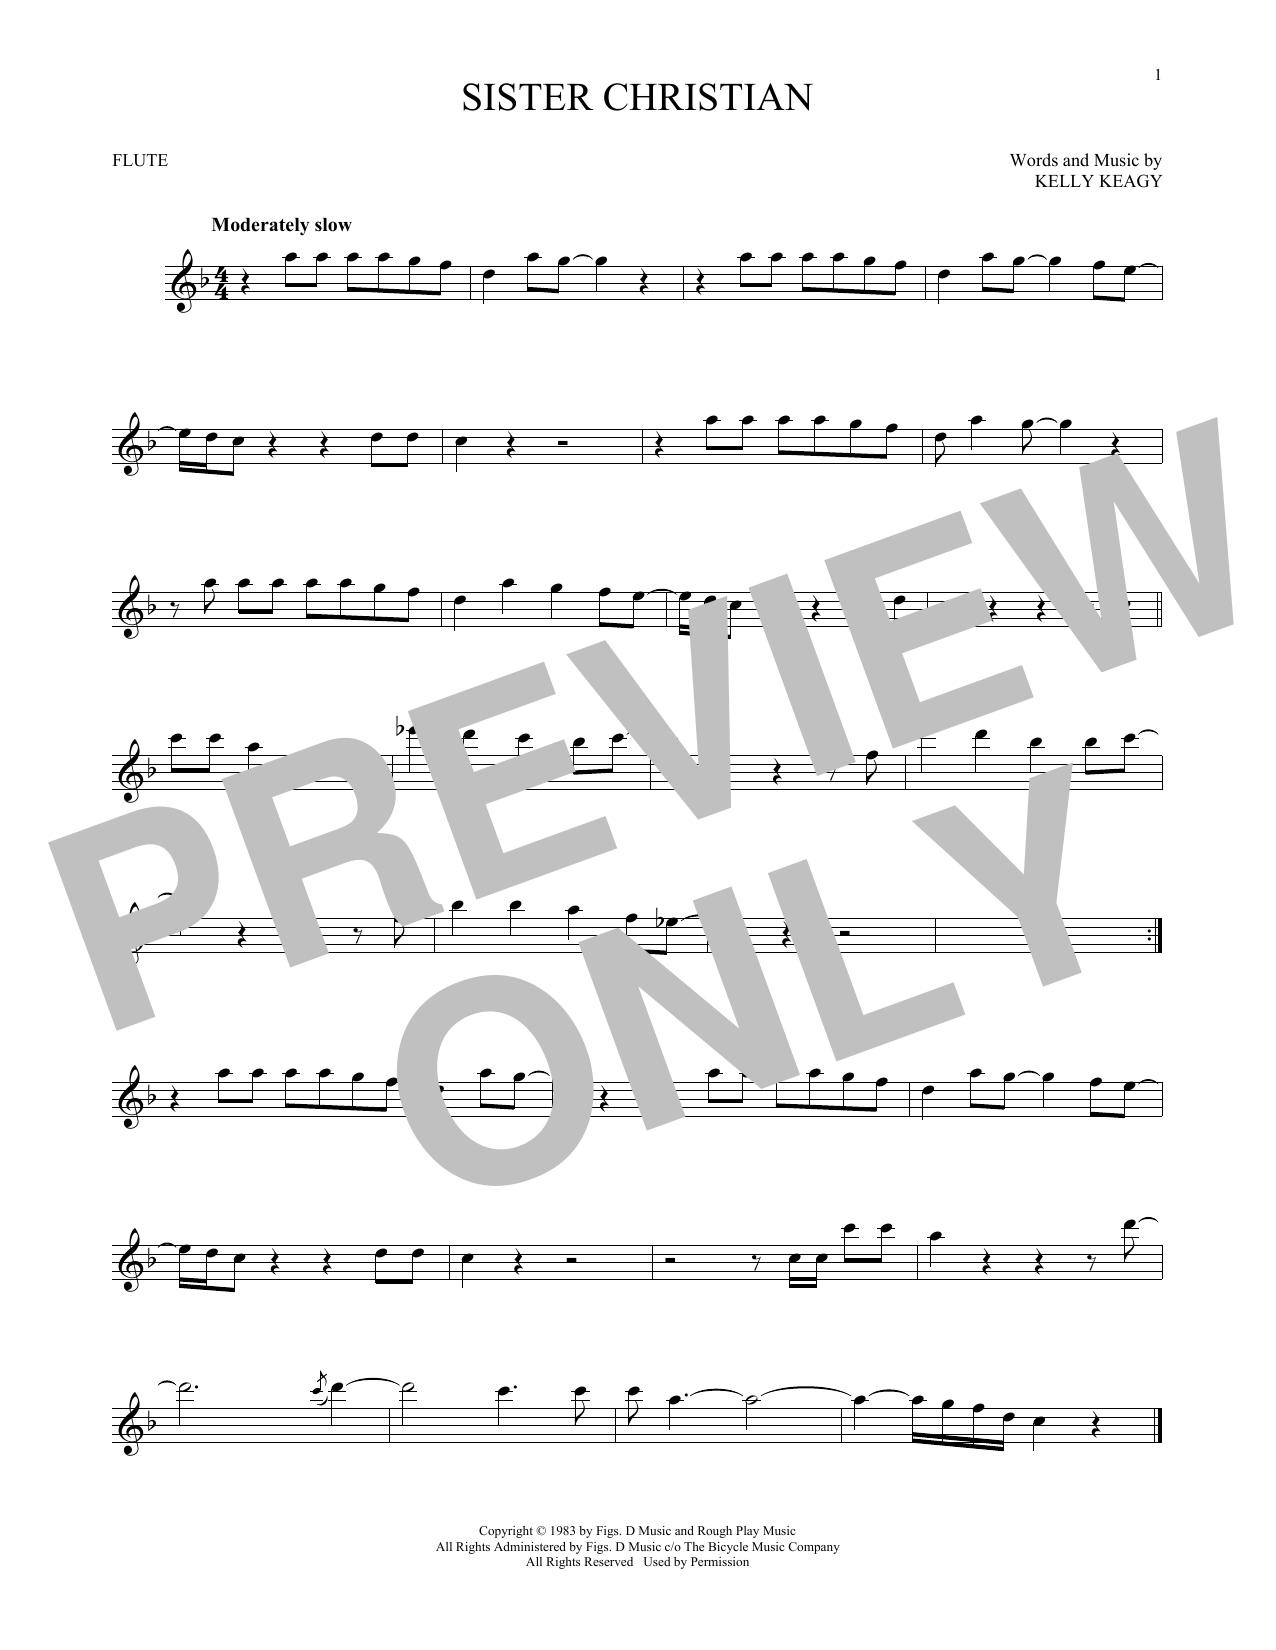 Sister Christian (Flute Solo)